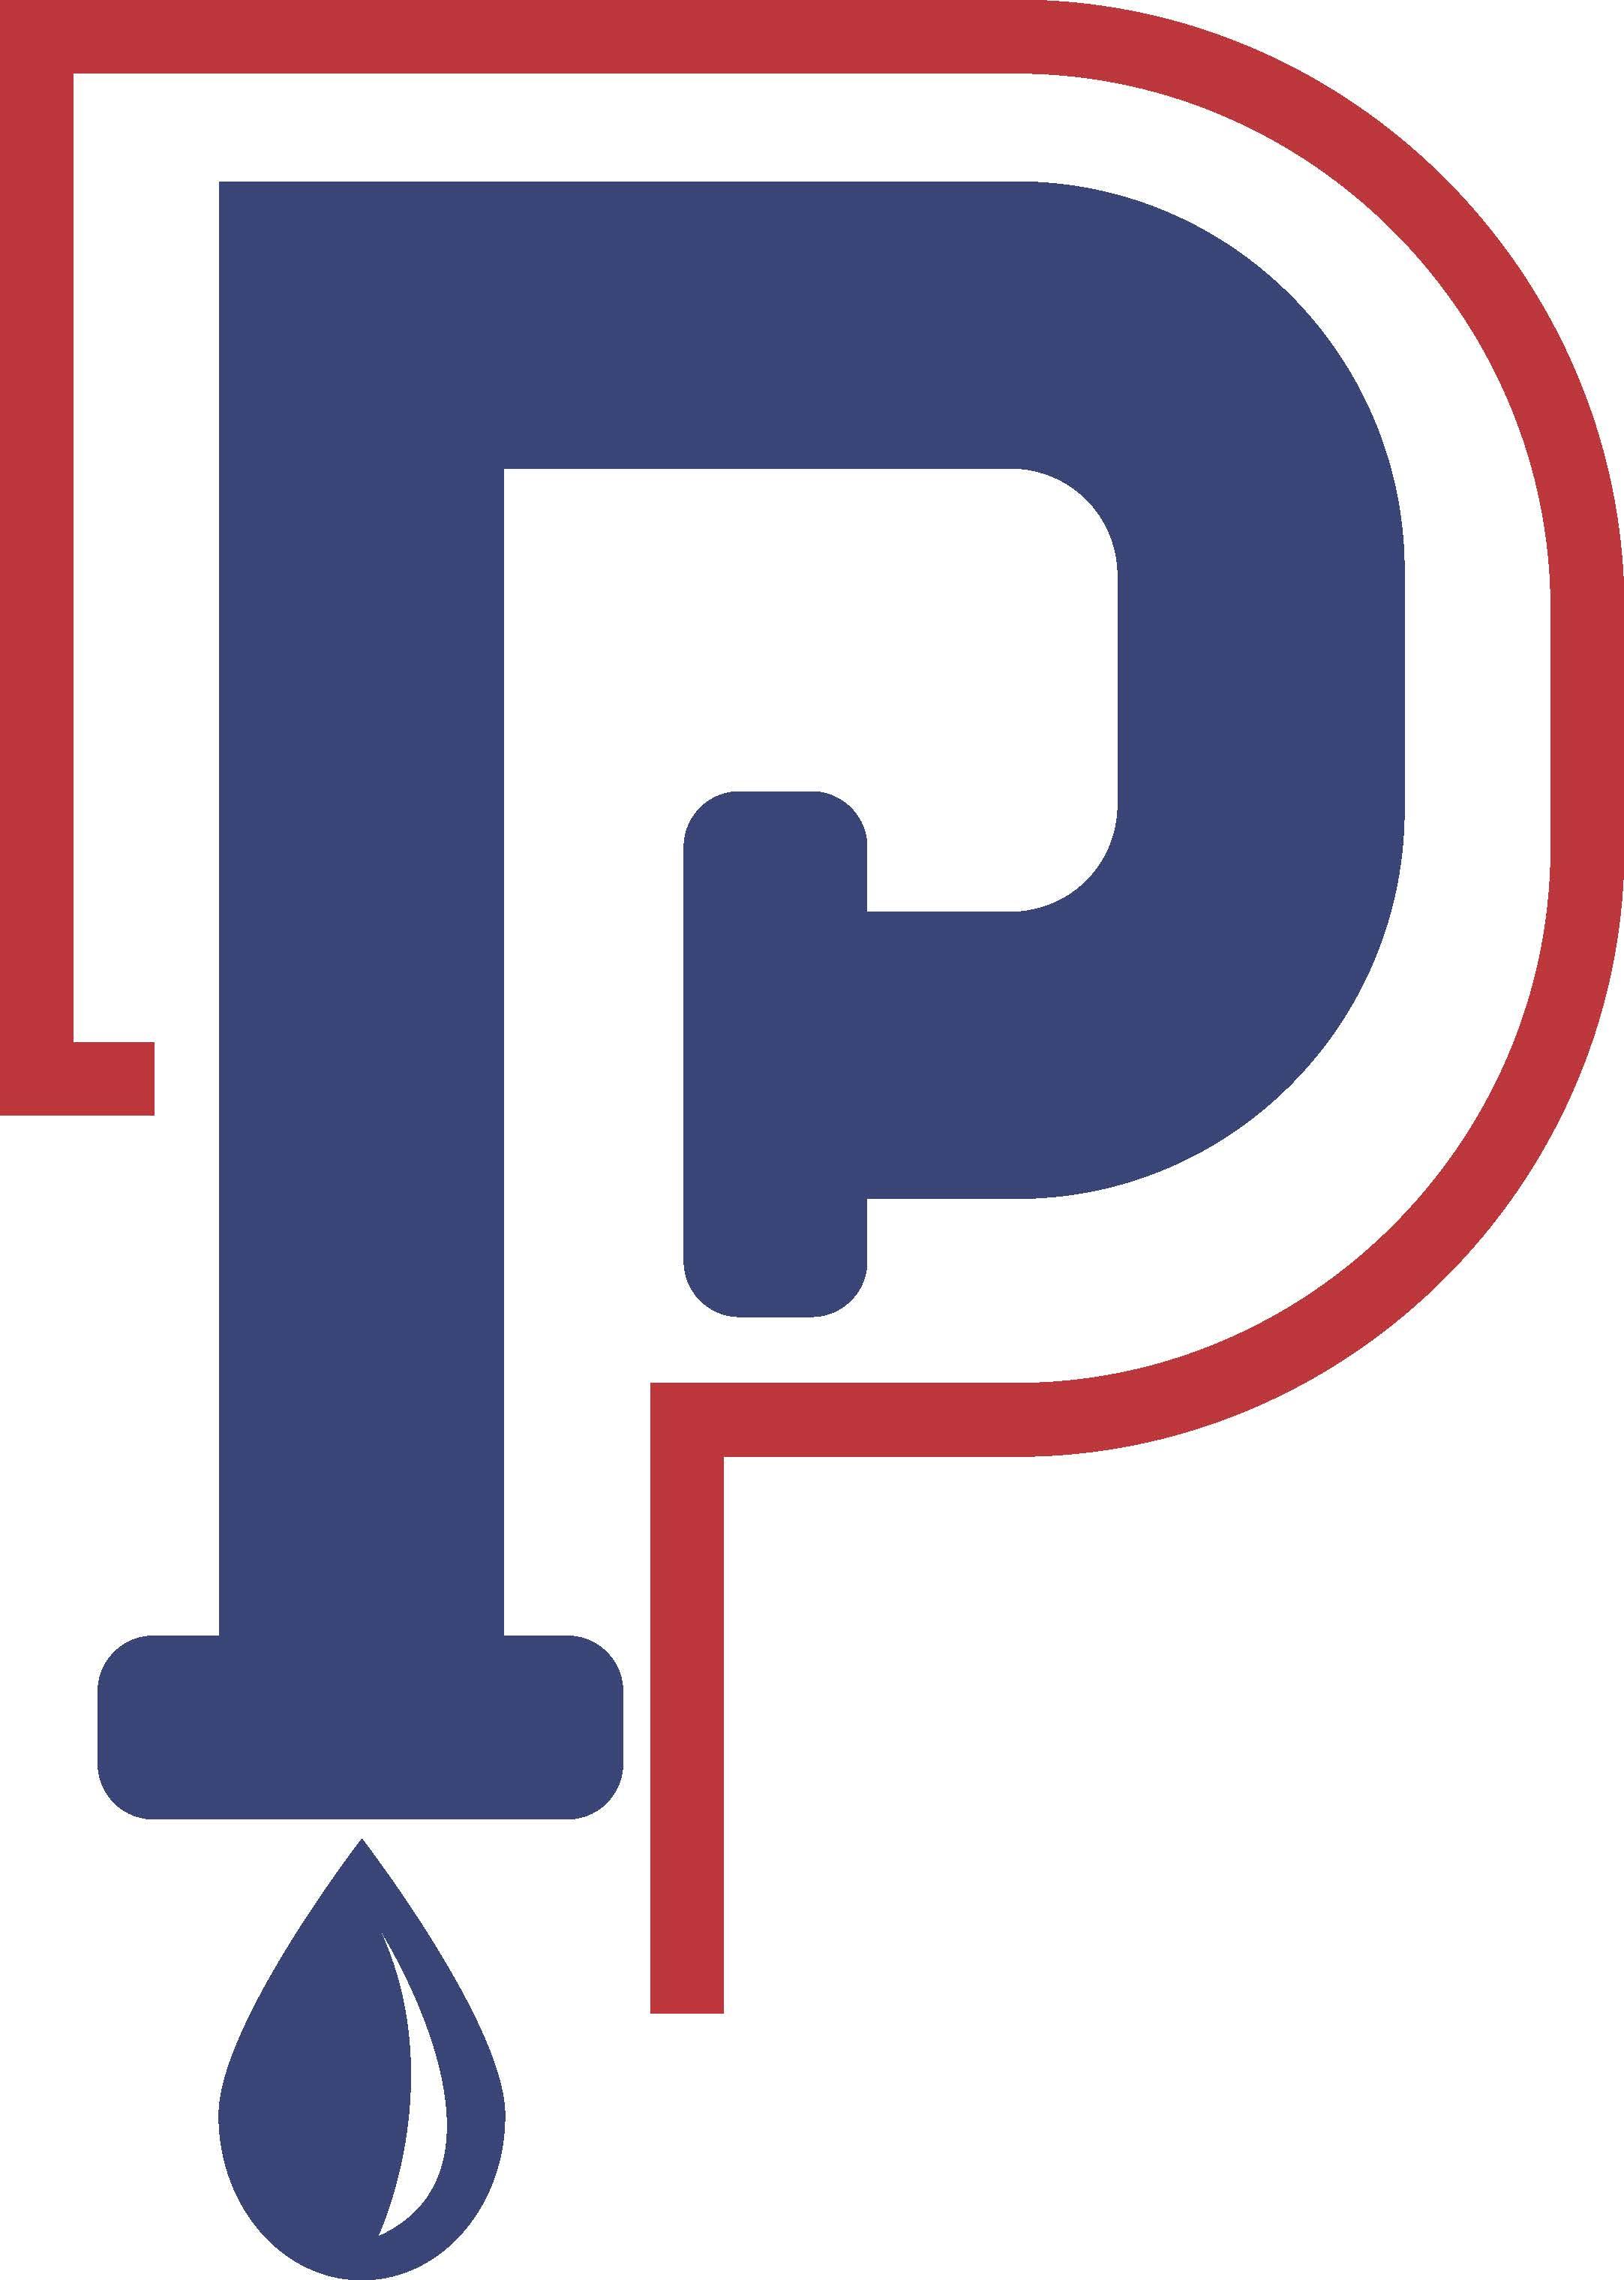 Premier Plumbing Inc. 2457 N Bundy Dr Ste 101, Fresno, CA 93727 - YP.com